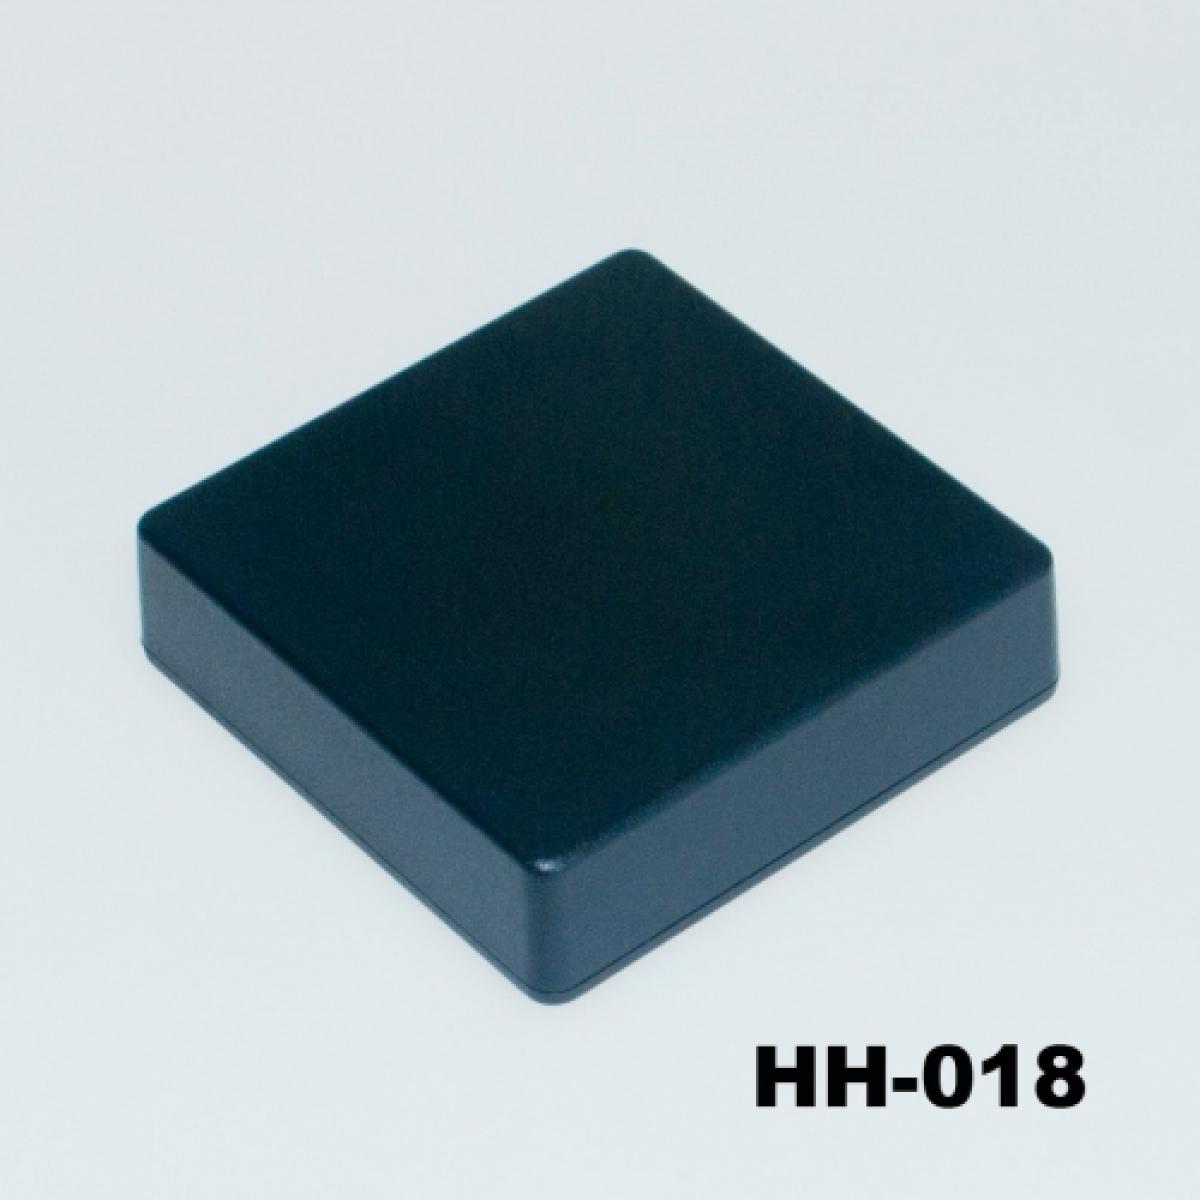 HH-018